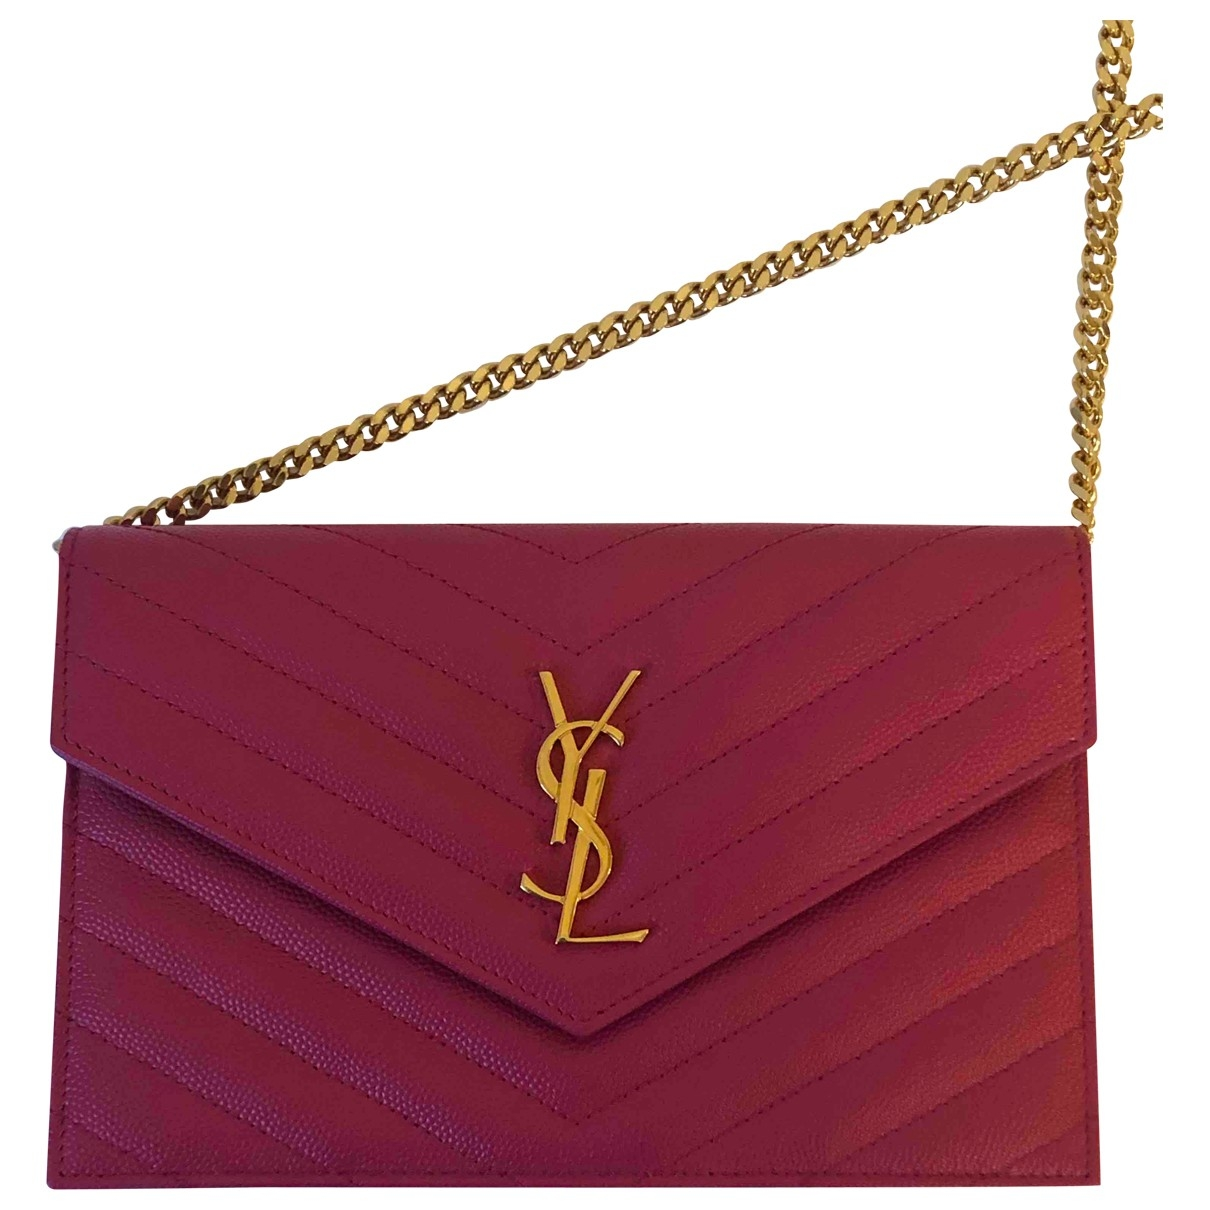 Saint Laurent Portefeuille enveloppe monogram Pink Leather handbag for Women \N